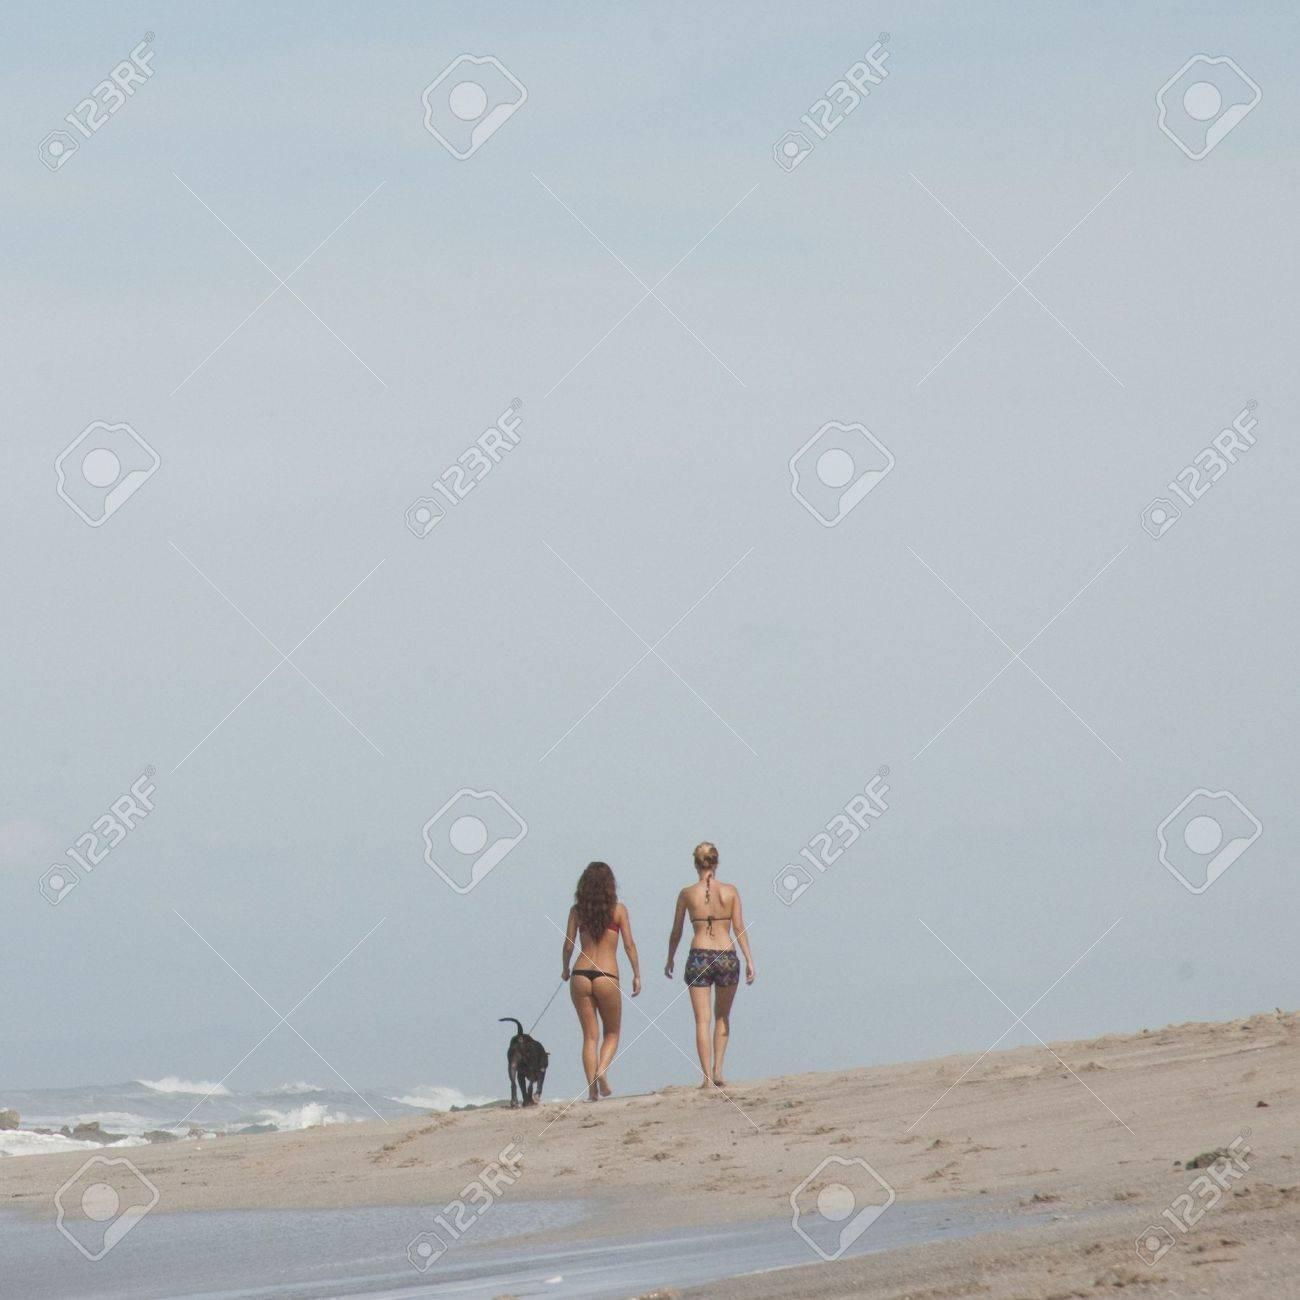 Two women walking on the beach in Costa Rica Stock Photo - 9259789